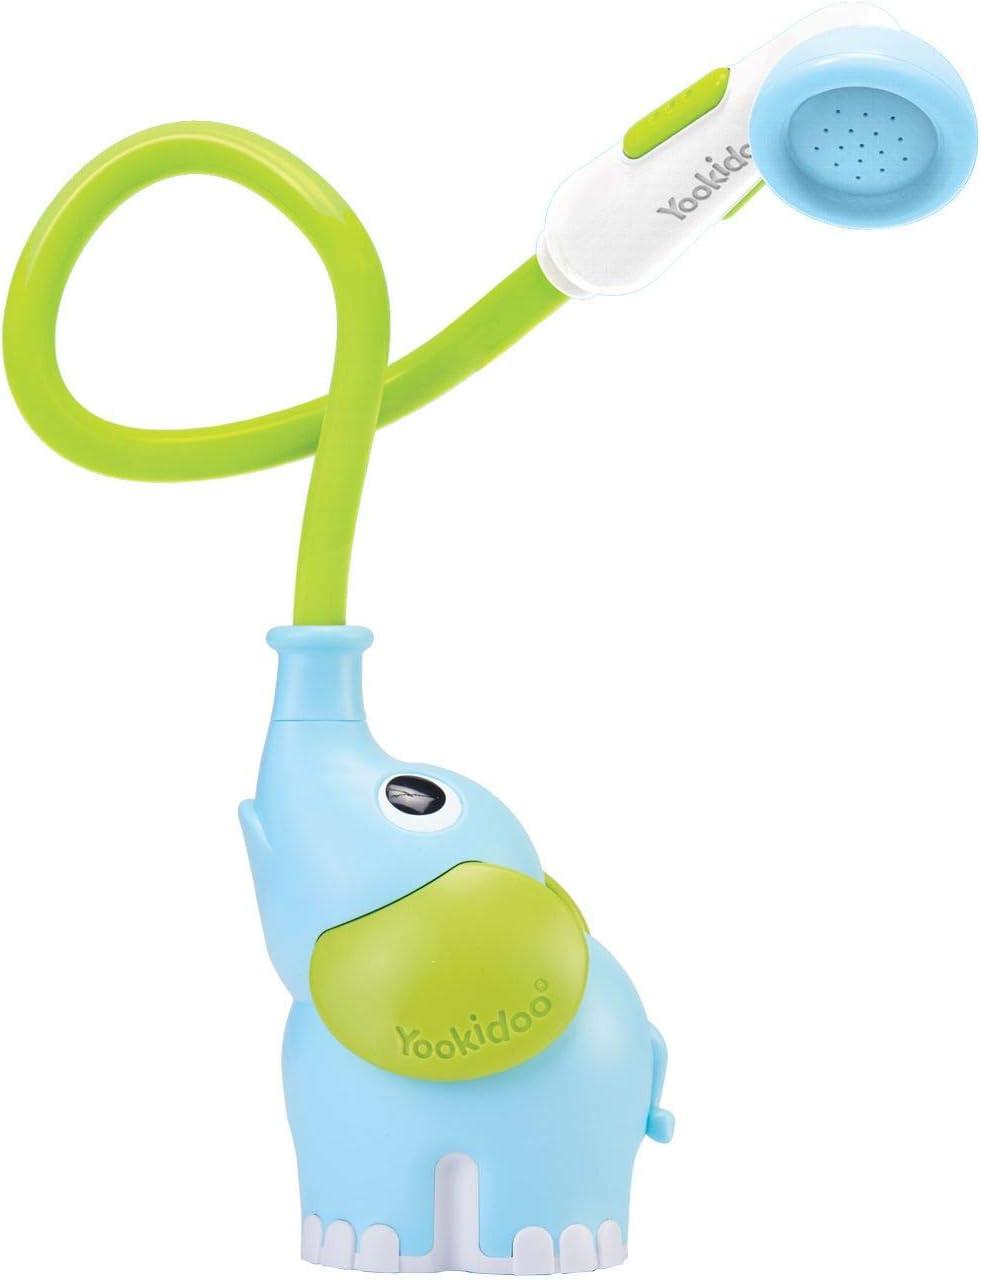 Yookidoo - Ducha bañera elefante azul, juguete bañera, juguete baño y ducha para bebé y niño